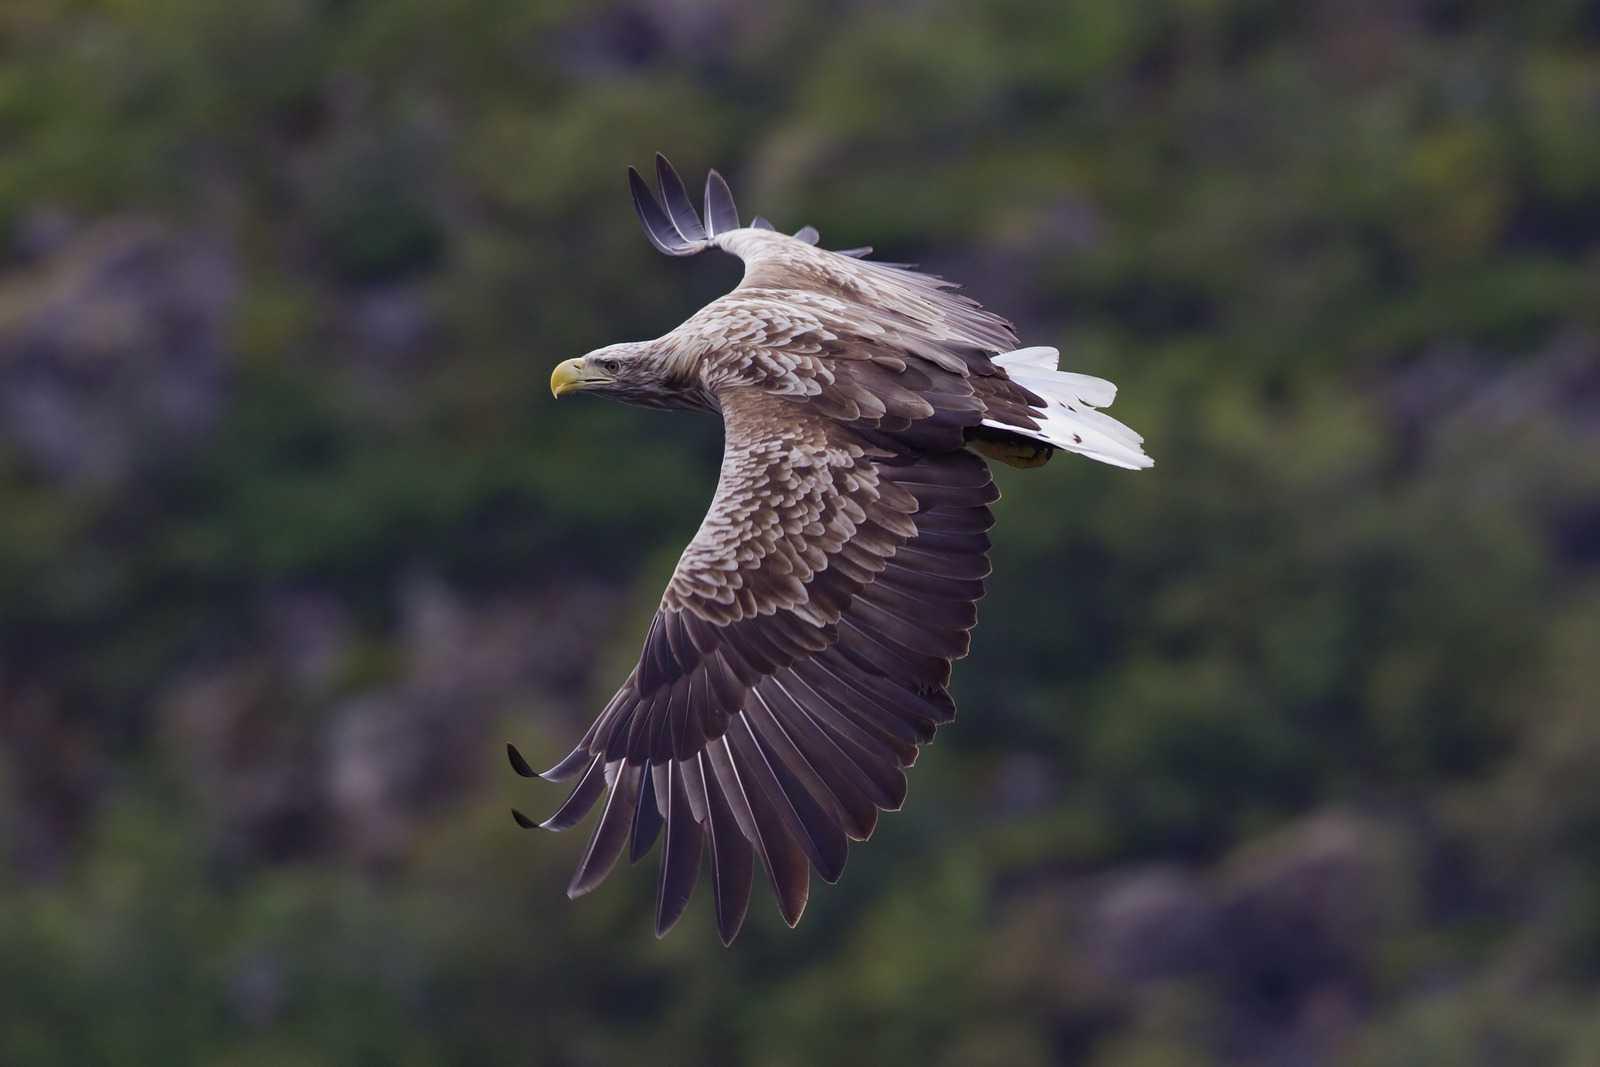 Орлан-белохвост. Фото: Yathin S Krishnappa/Wikimedia/CC-BY-SA-3.0.